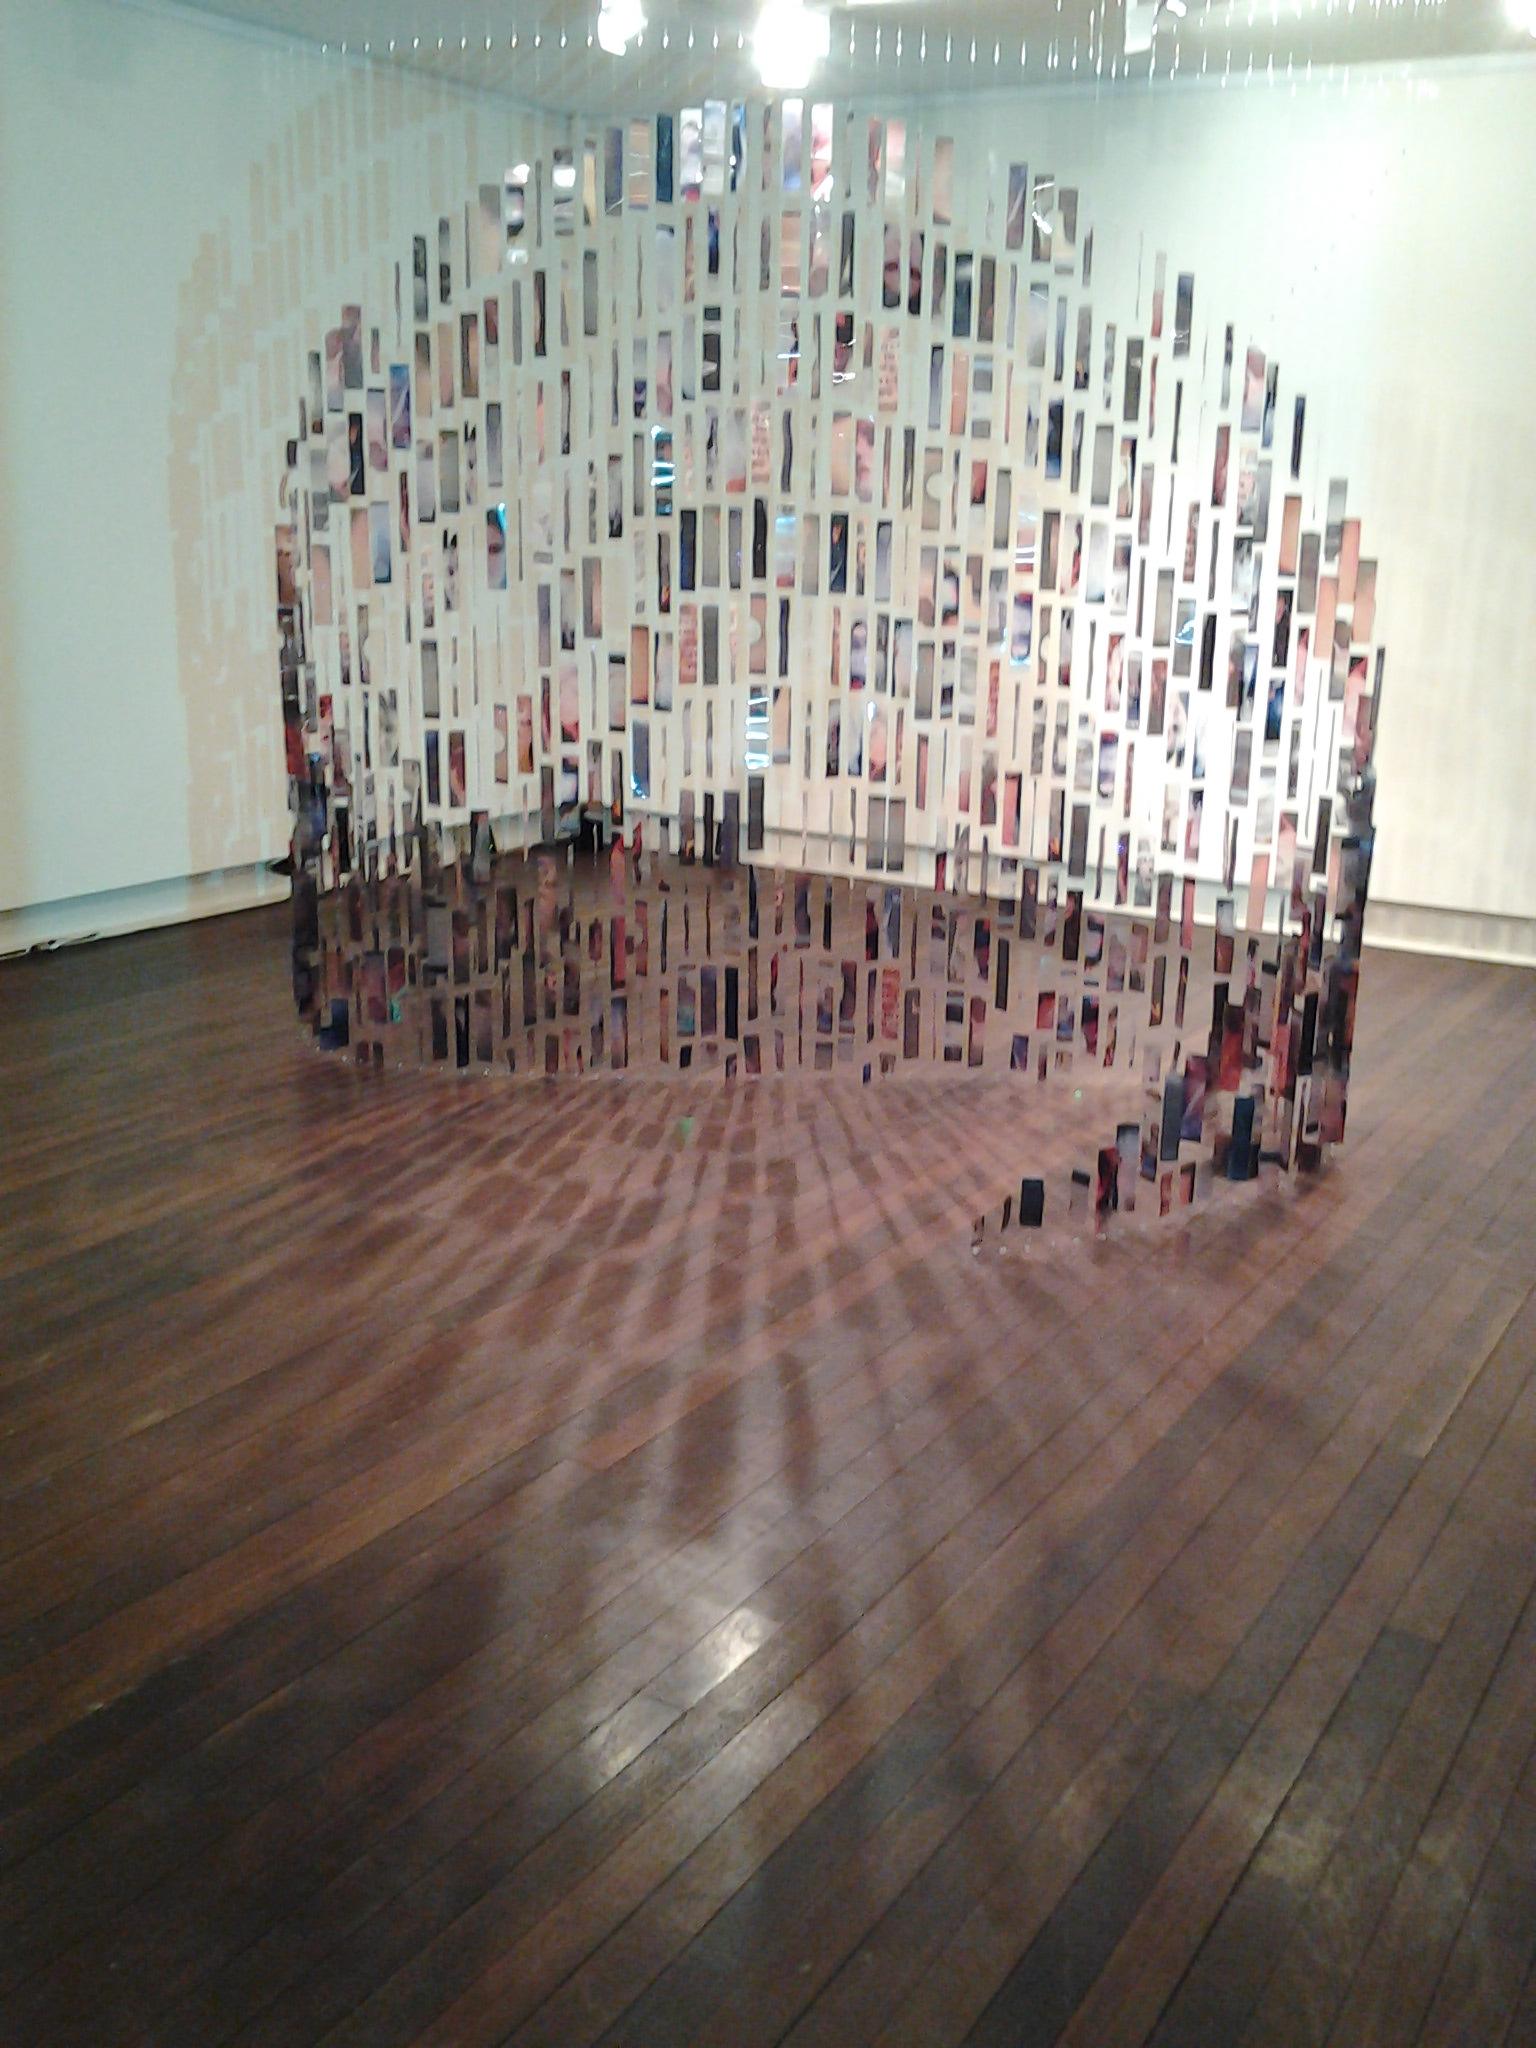 Barossa International Gallery, South Australia, 2012